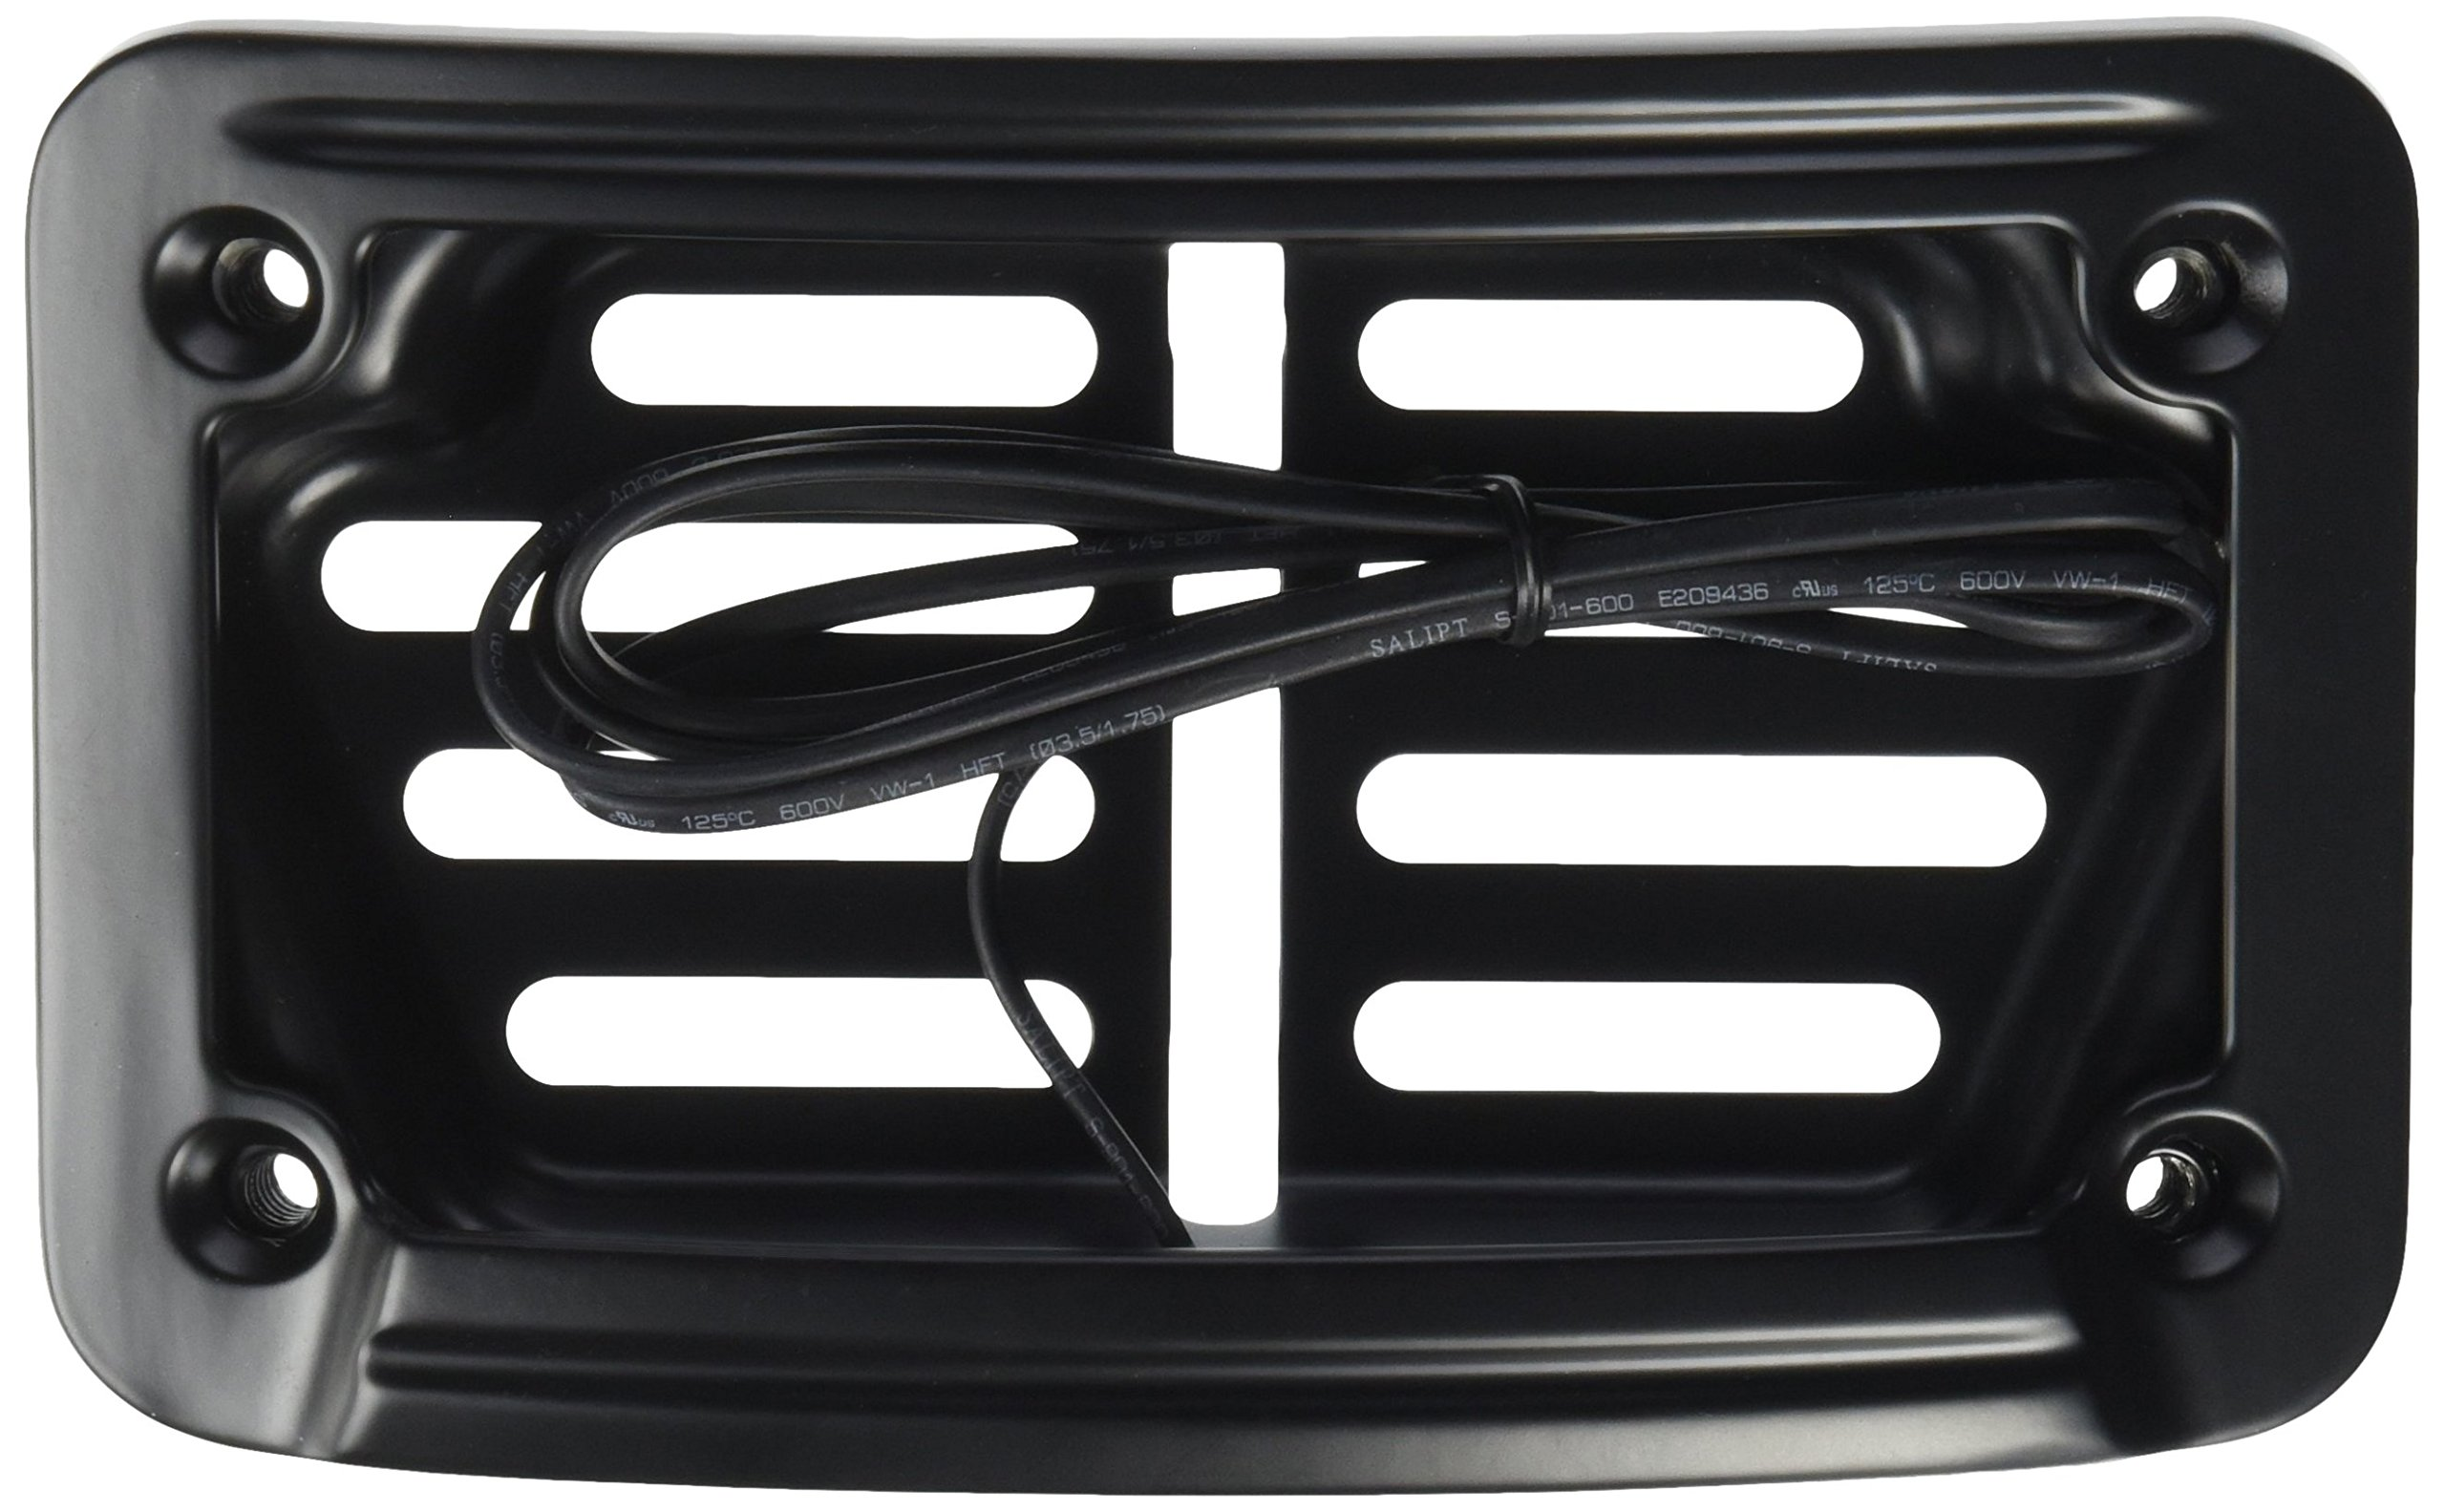 Kuryakyn 7678 Satin Black Laydown Curved LED License Plate by Kuryakyn (Image #1)